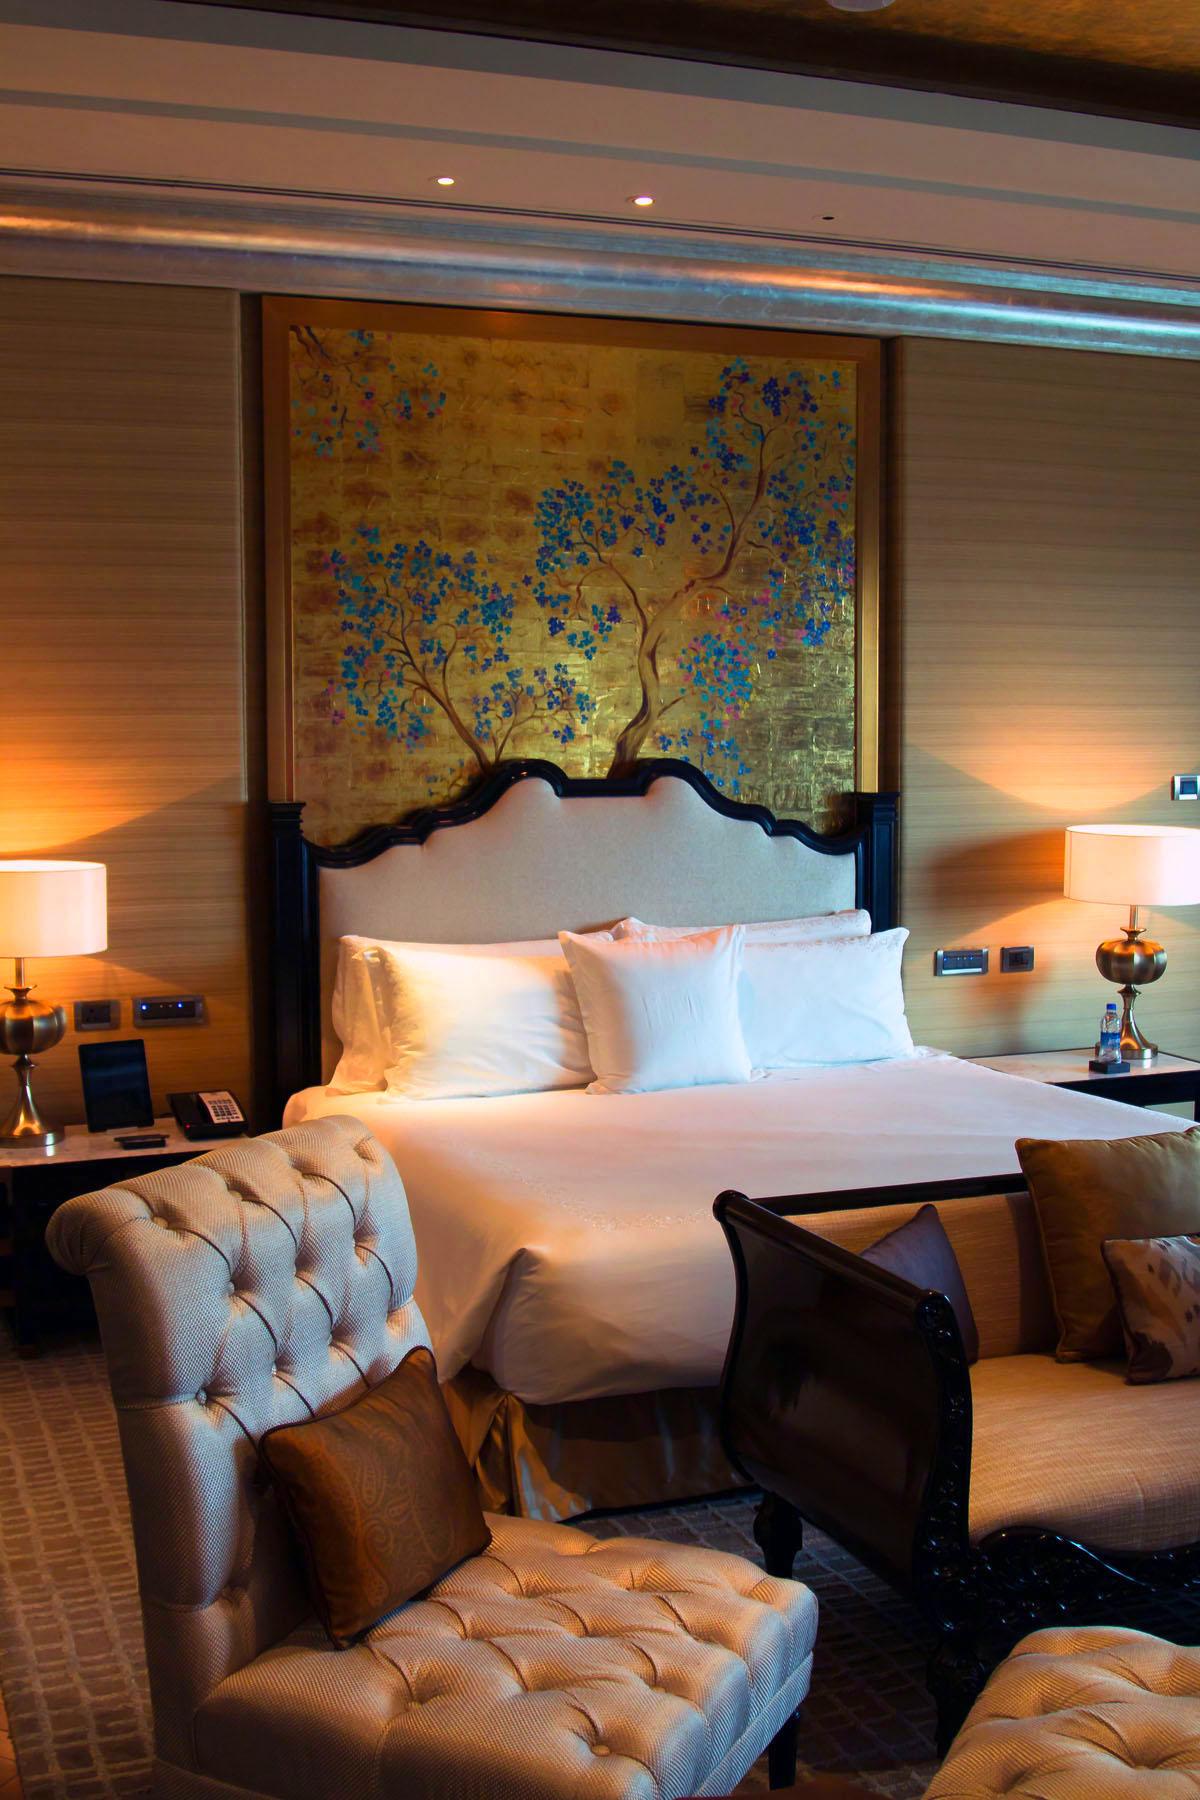 INDIEN_ITC_Grand_Chola_Hotel_Chennai_FINEST-onTour_7074.jpg